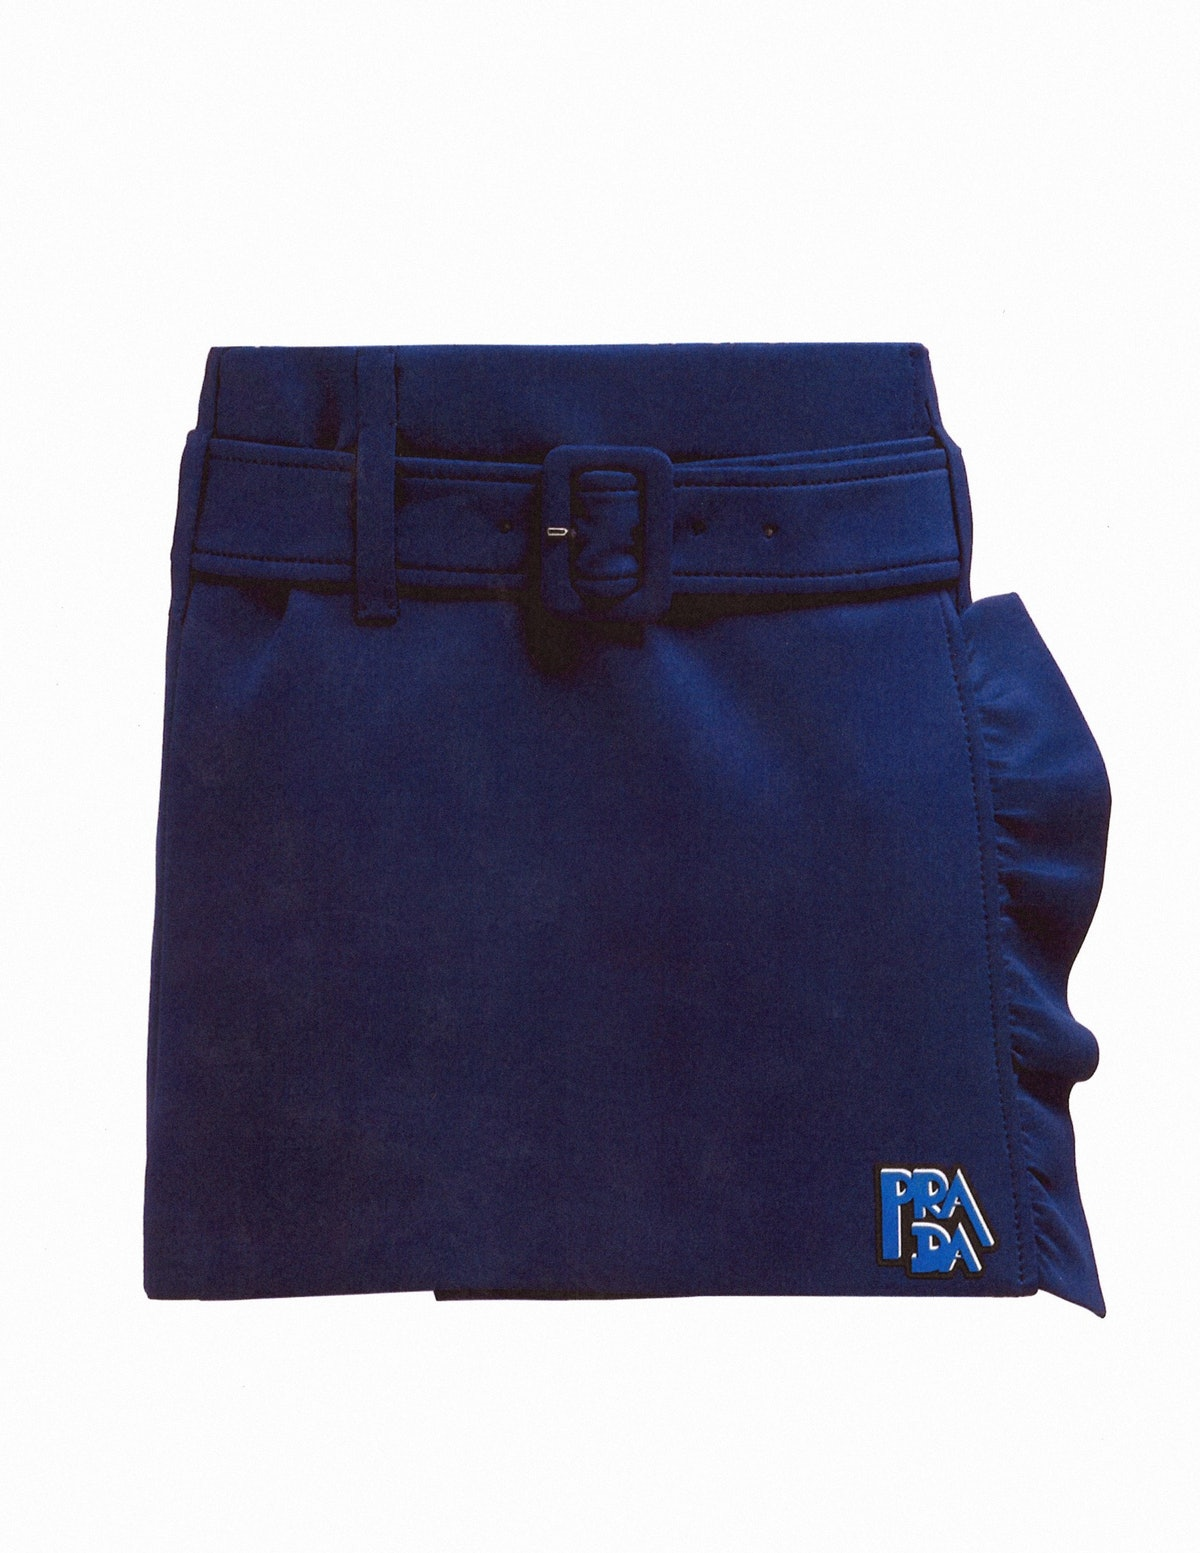 18_Prada Mini Skirt.JPG